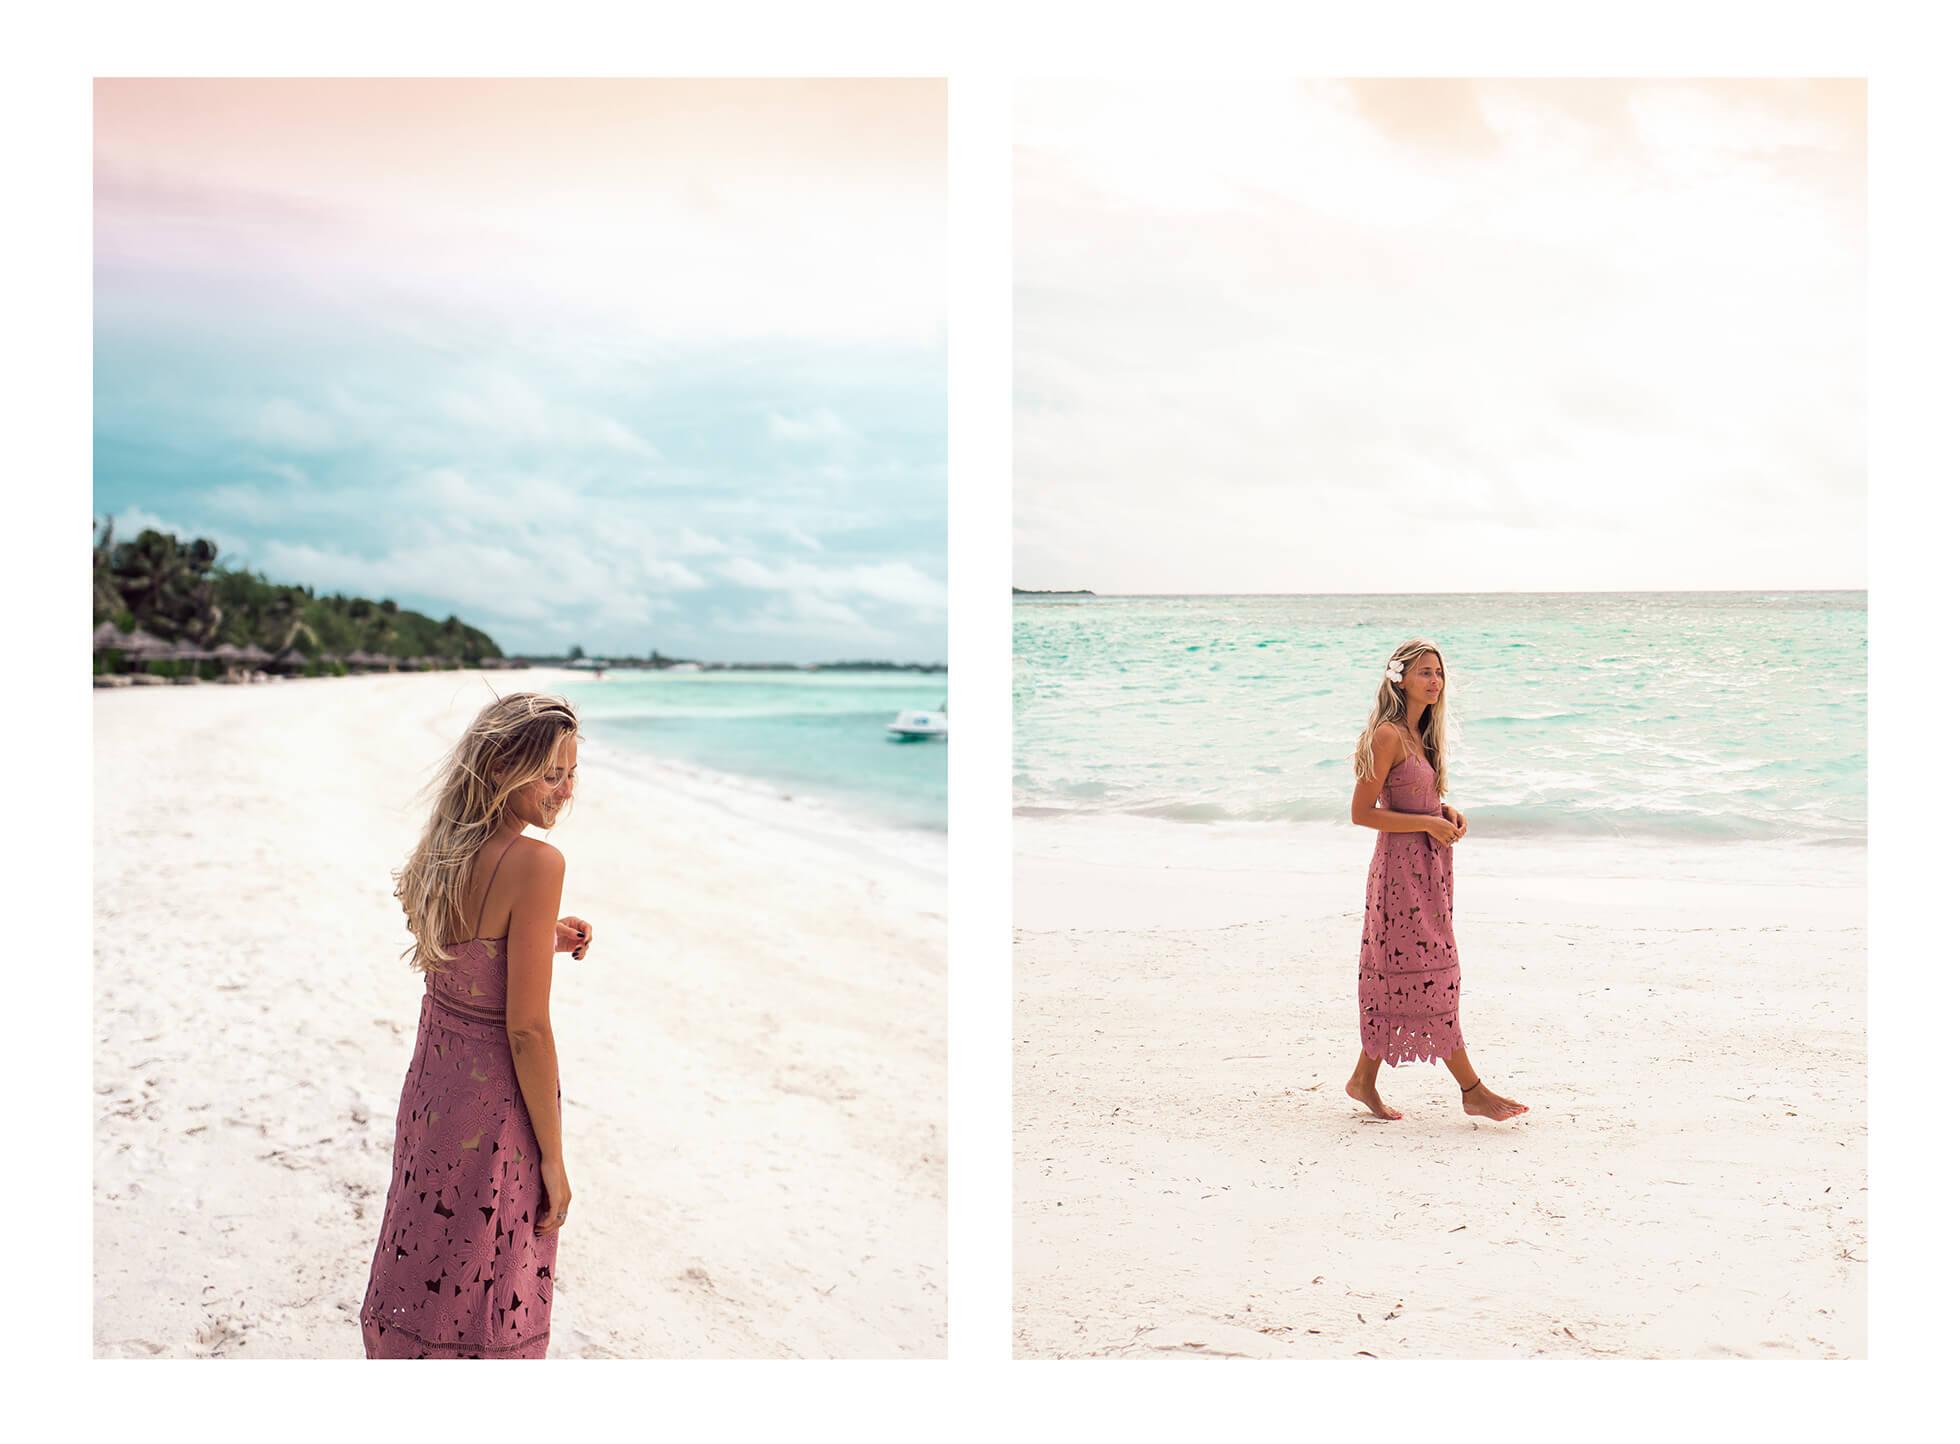 janni-deler-flower-dress-maldivesl1150037-redigera-copy